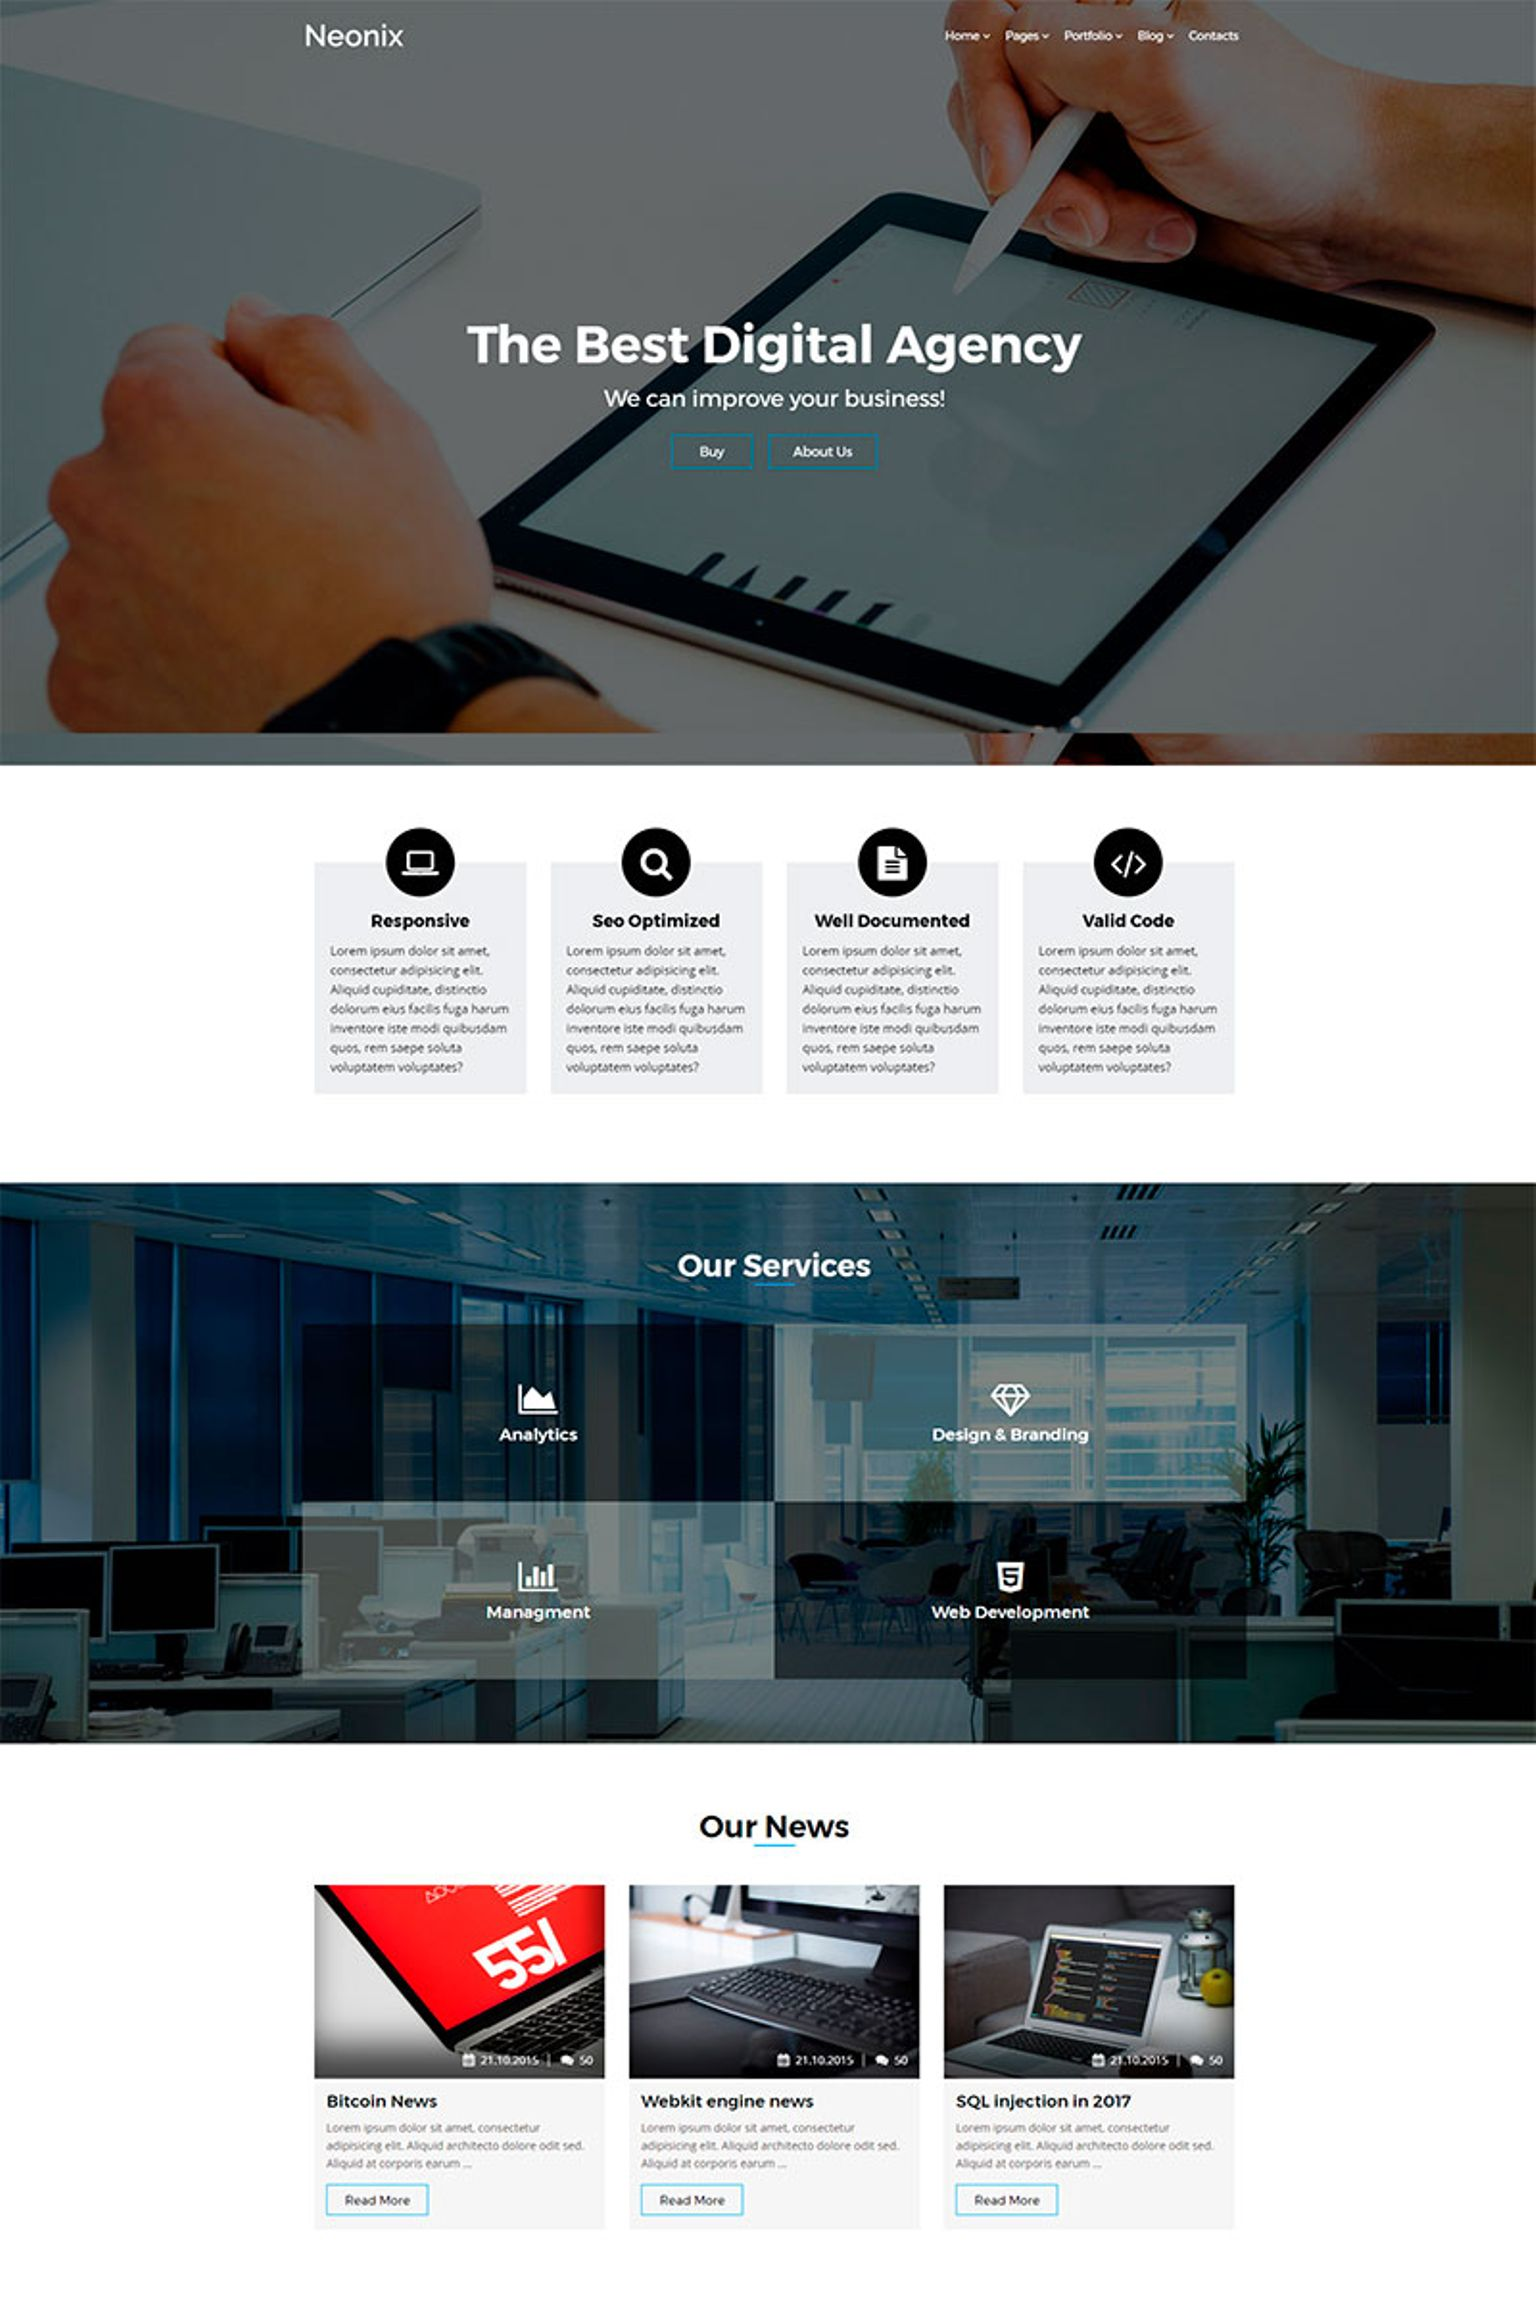 Neonix - Digital Agency №65440 - скриншот